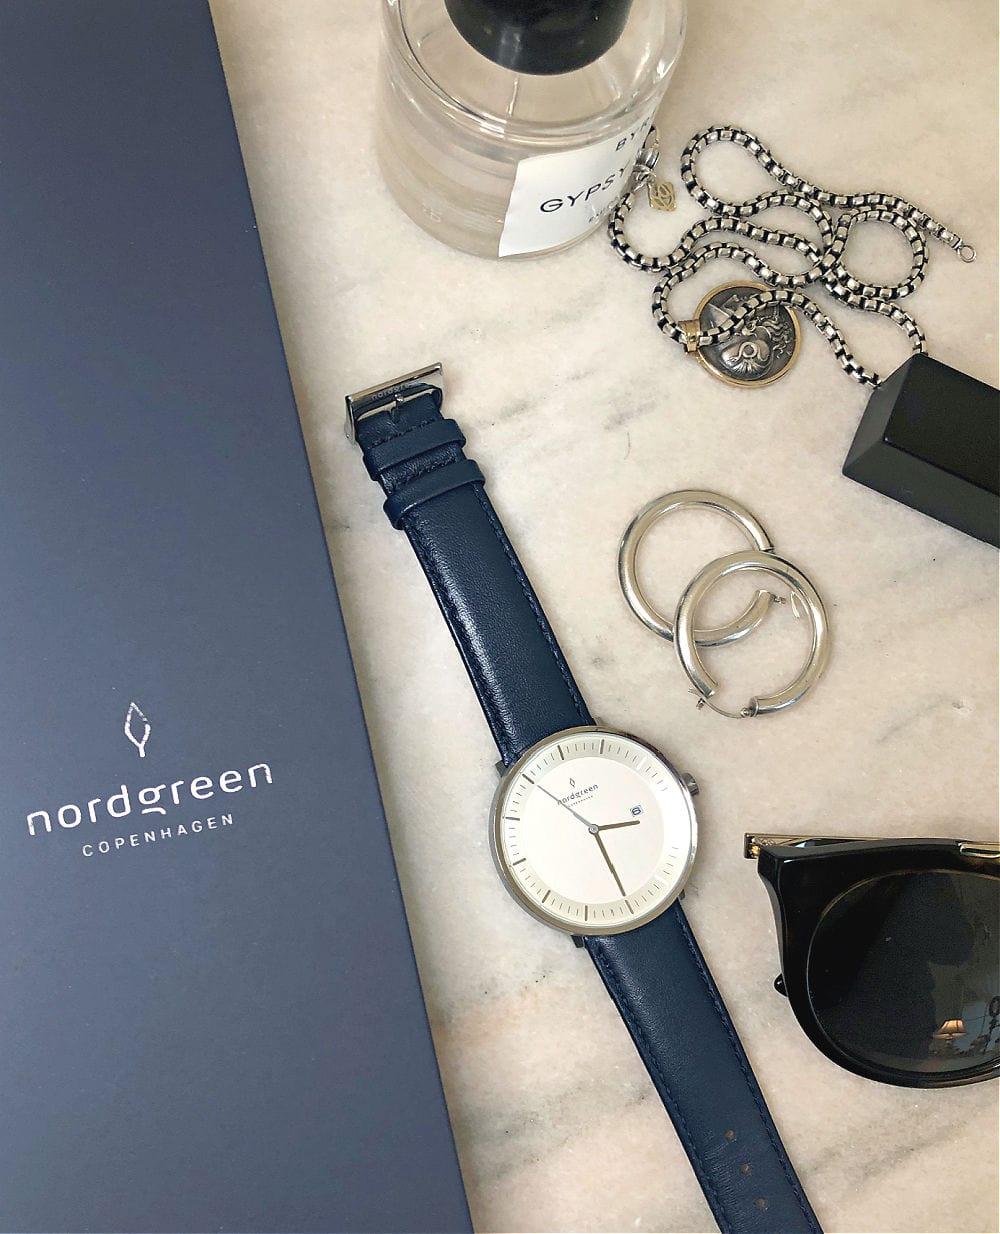 flat lay witrh nordgreen watch